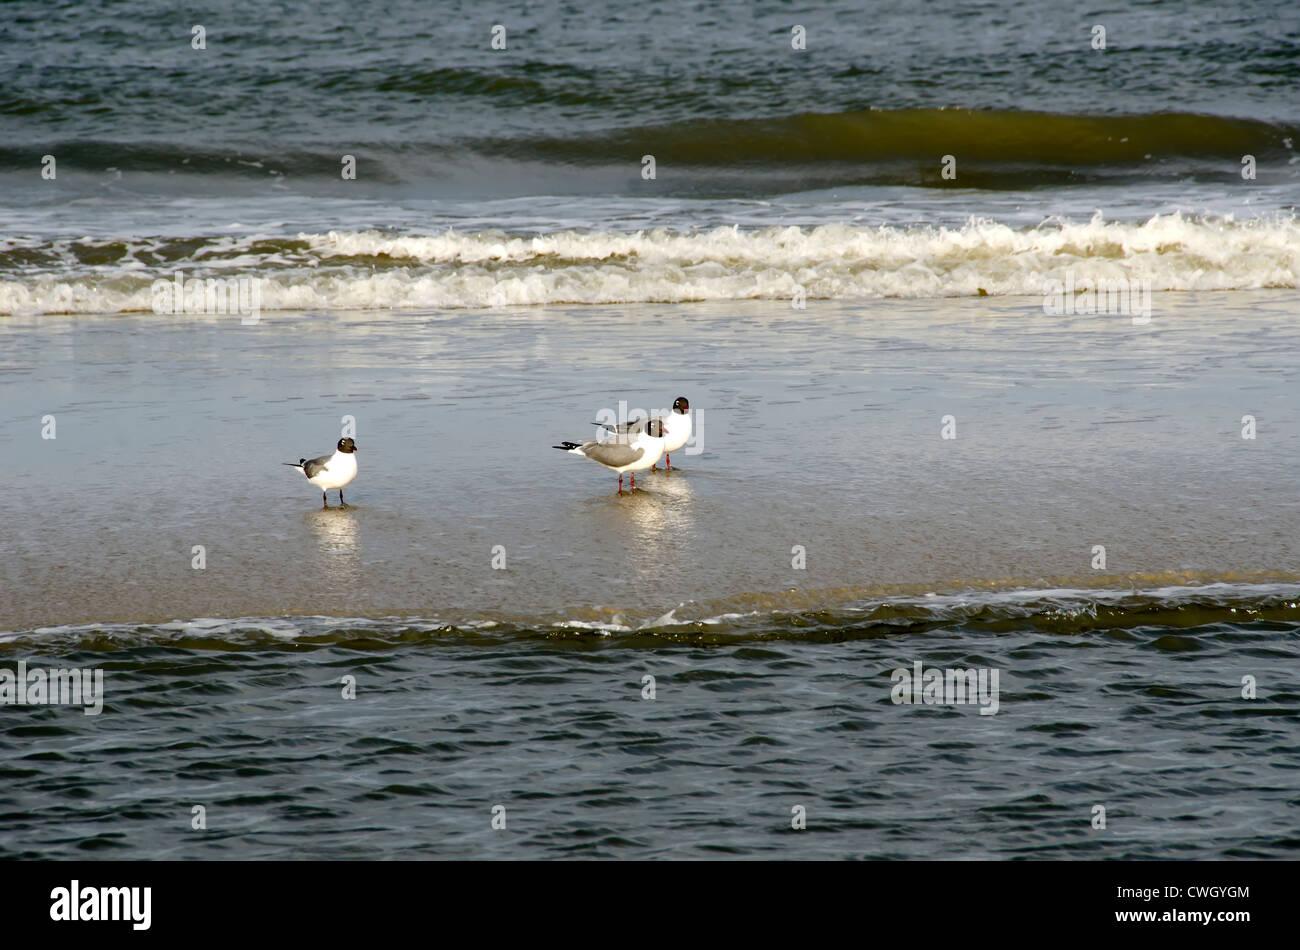 Three American Oyster Catchers (Haematopus palliatus) near the surfline on deserted beach at Corolla, North Carolina - Stock Image